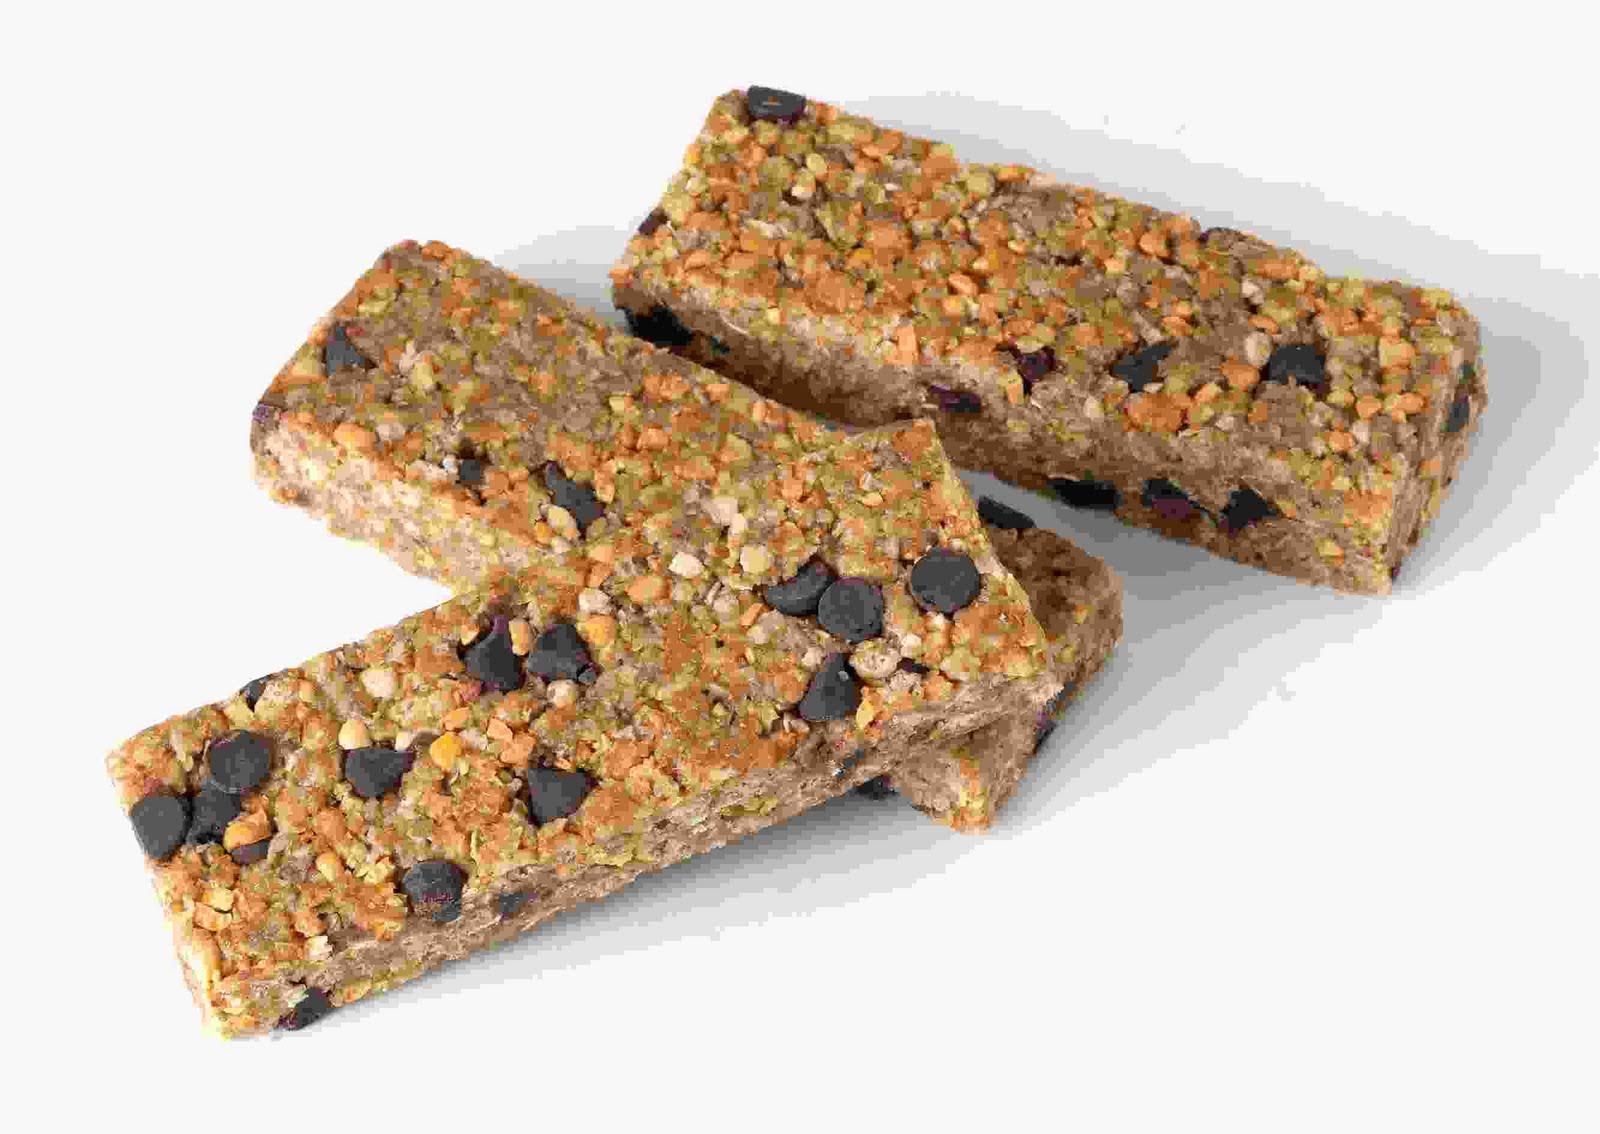 153482ec8ab The Nut-Free Mom Blog  Peanut Allergy News  Nut-Free Granola Snack ...